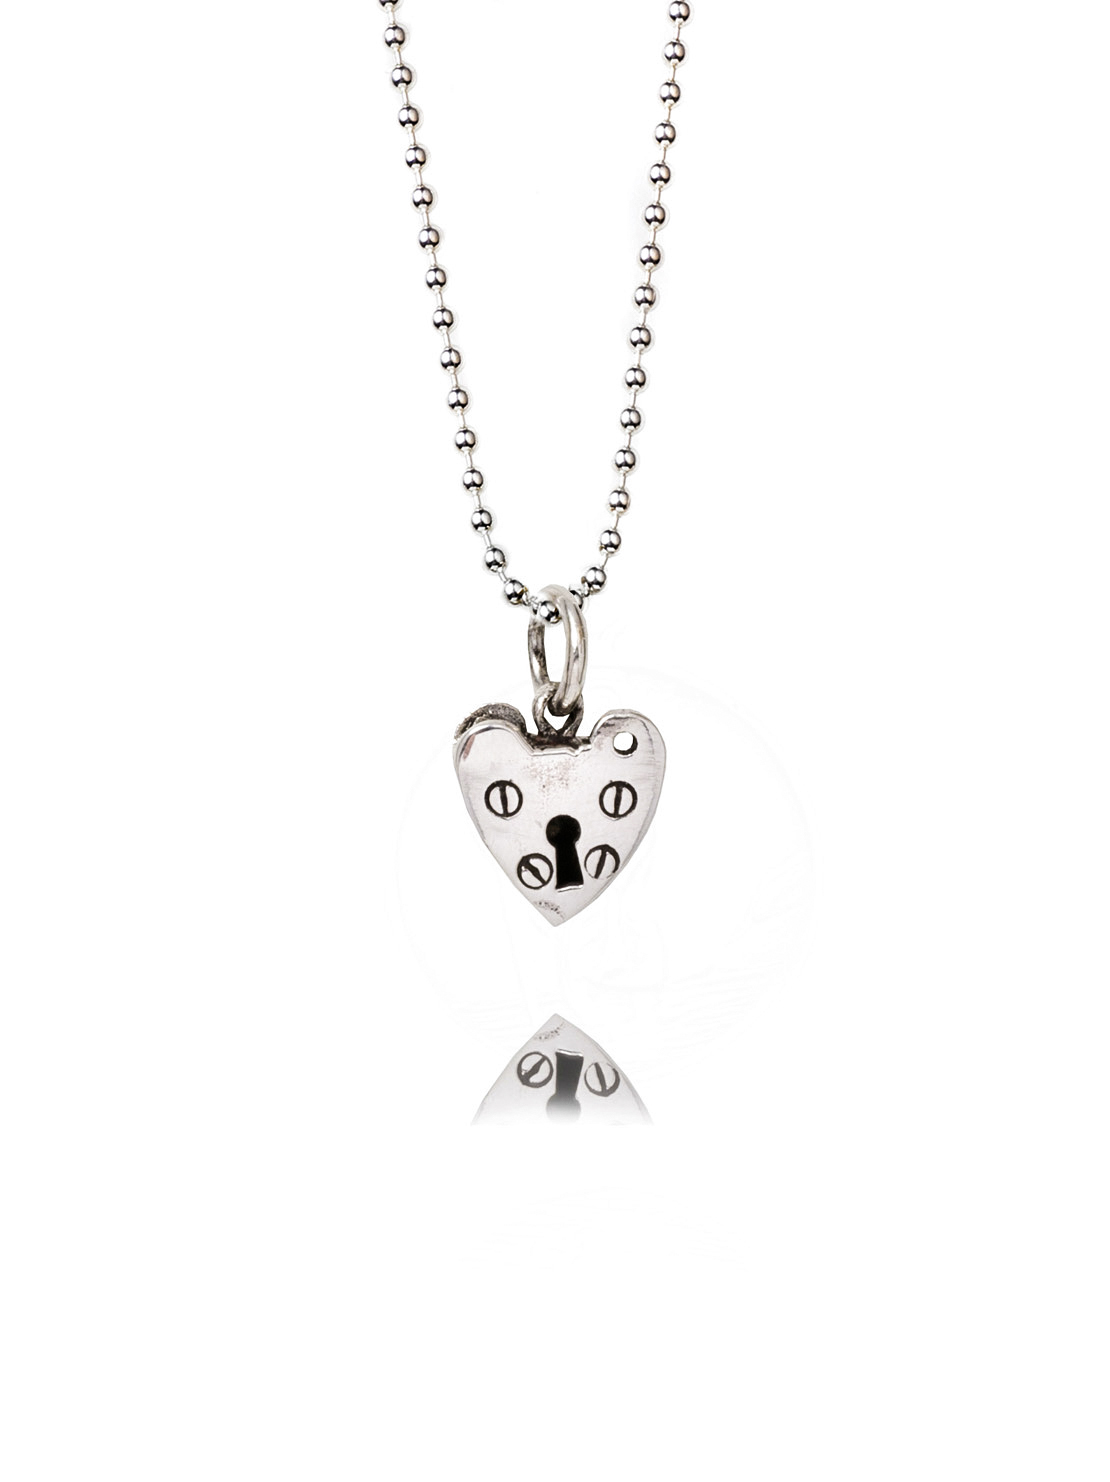 Tiny Silver Heart Necklace